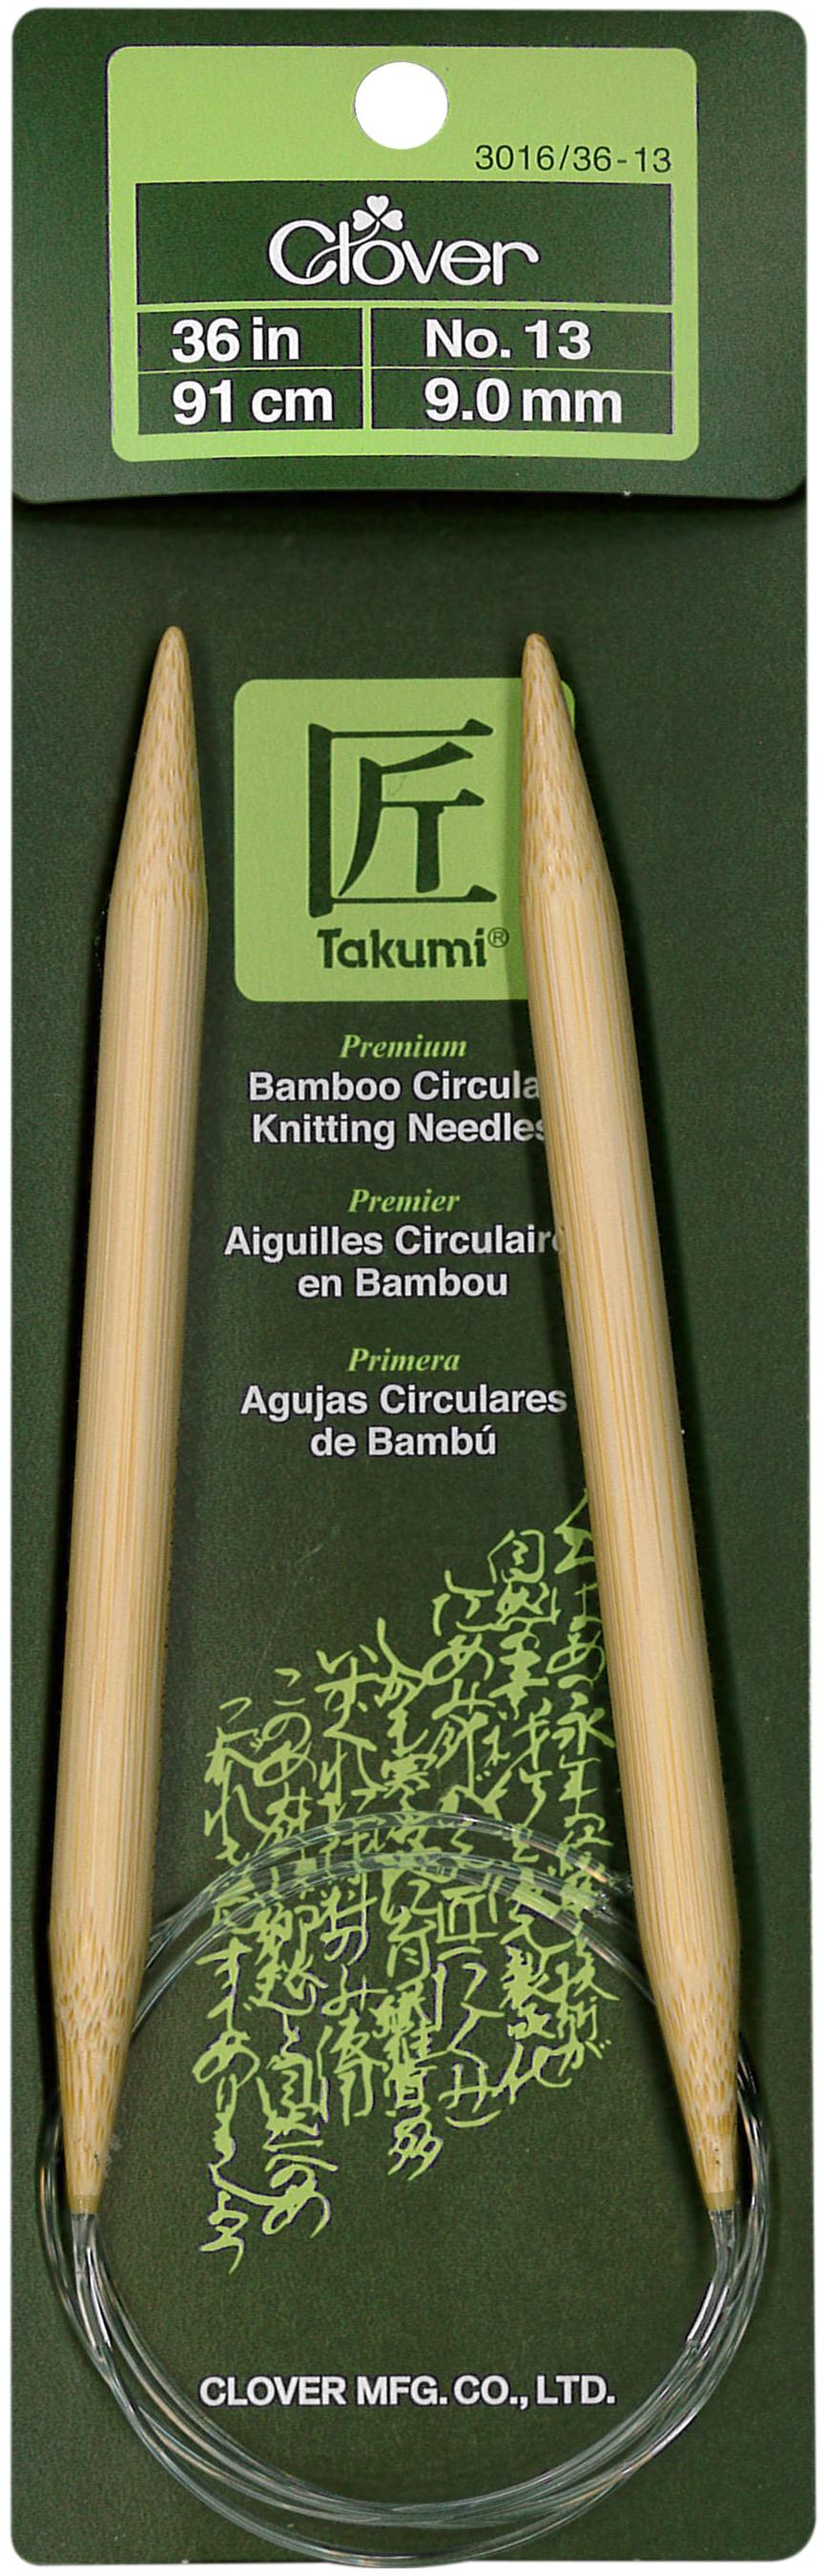 Takumi Bamboo Circular Knitting Needles 36-Size 13/9mm